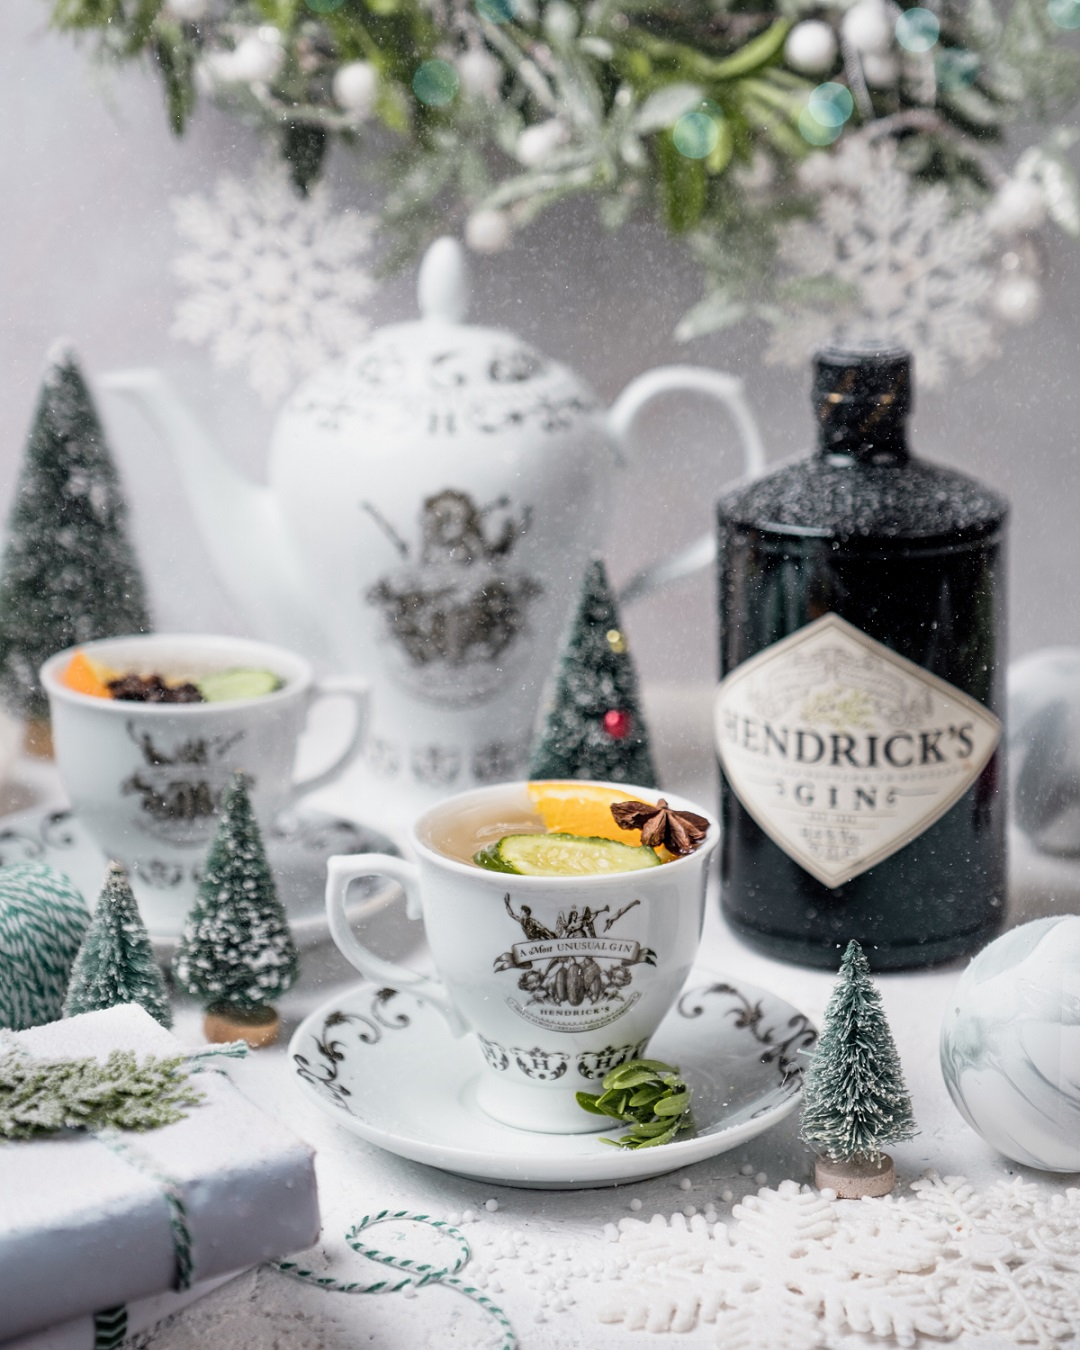 Here's why Hendrick's Gin will make a wonderful gift